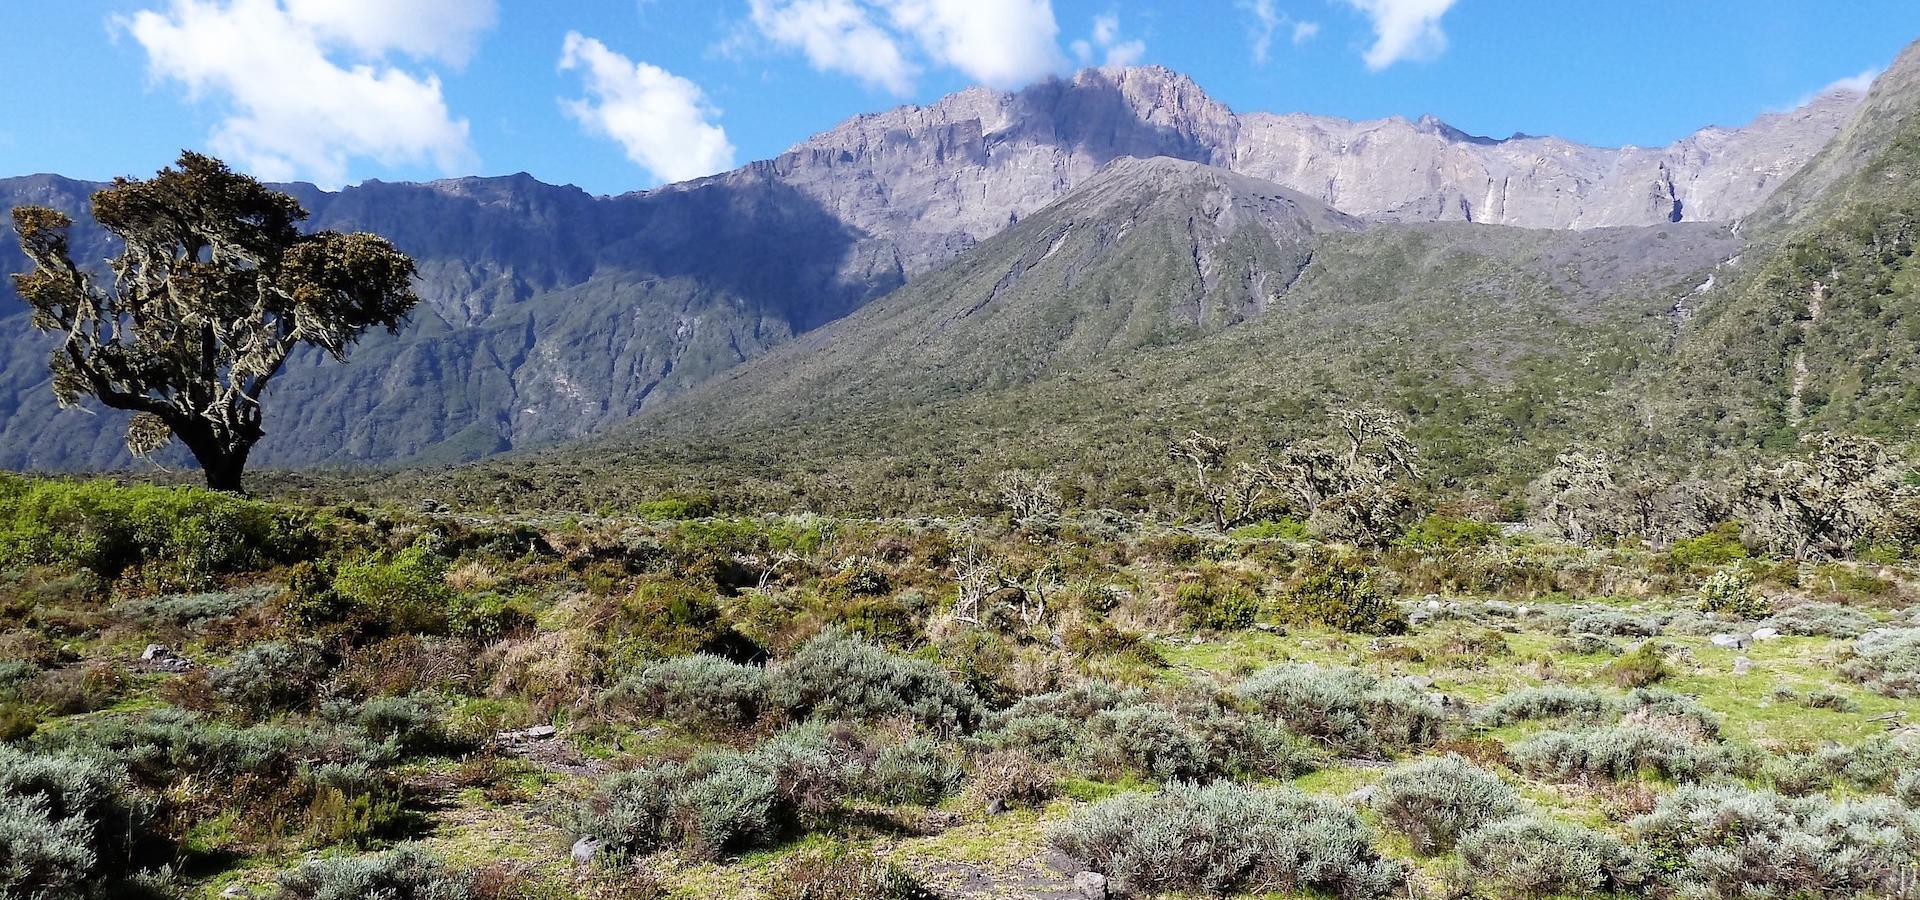 Mt. Meru & African View Trekkingtour Mt. Meru, Kultur- und Safarikombination